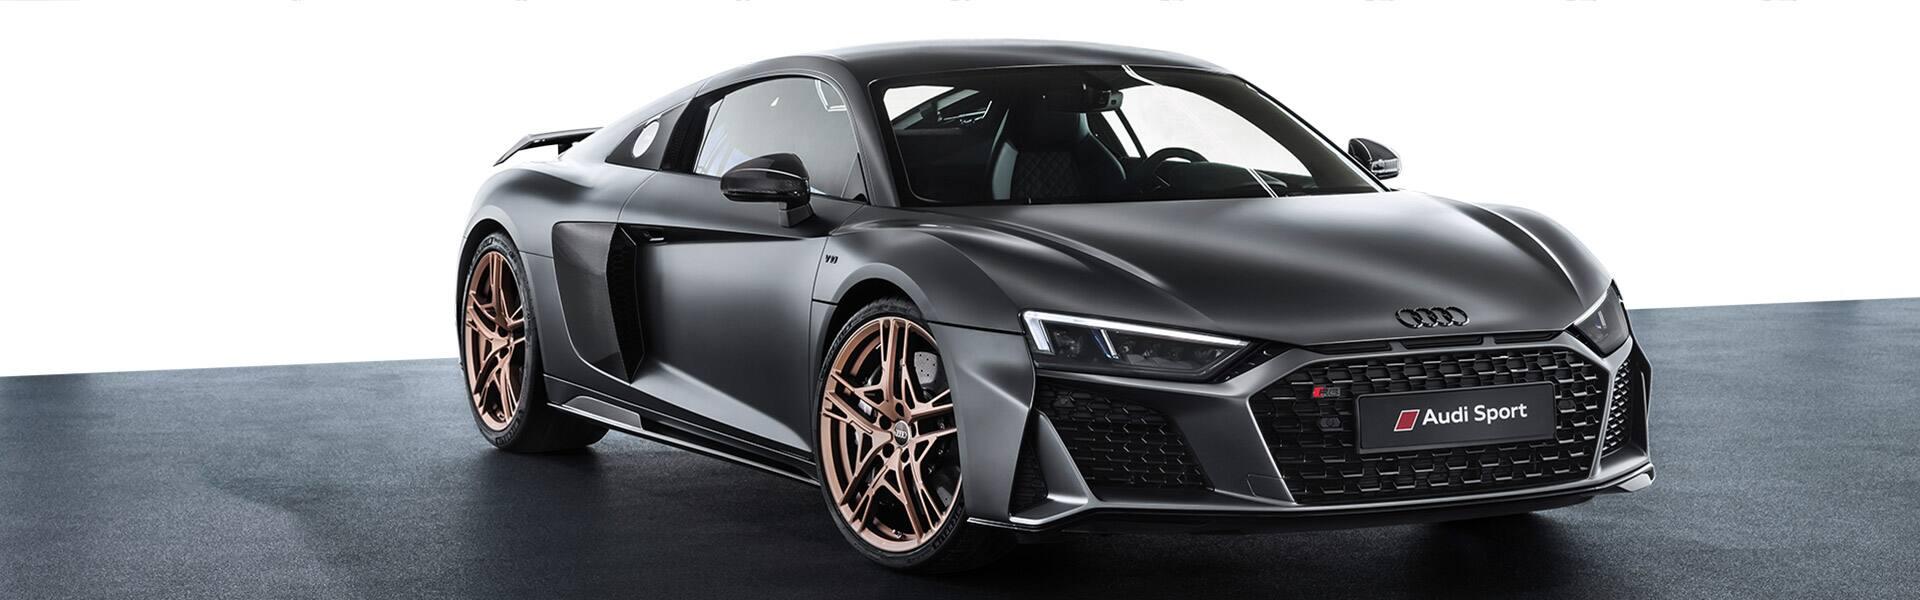 R8 V10 Decennium R8 Audi Polska Przewaga Dzieki Technice